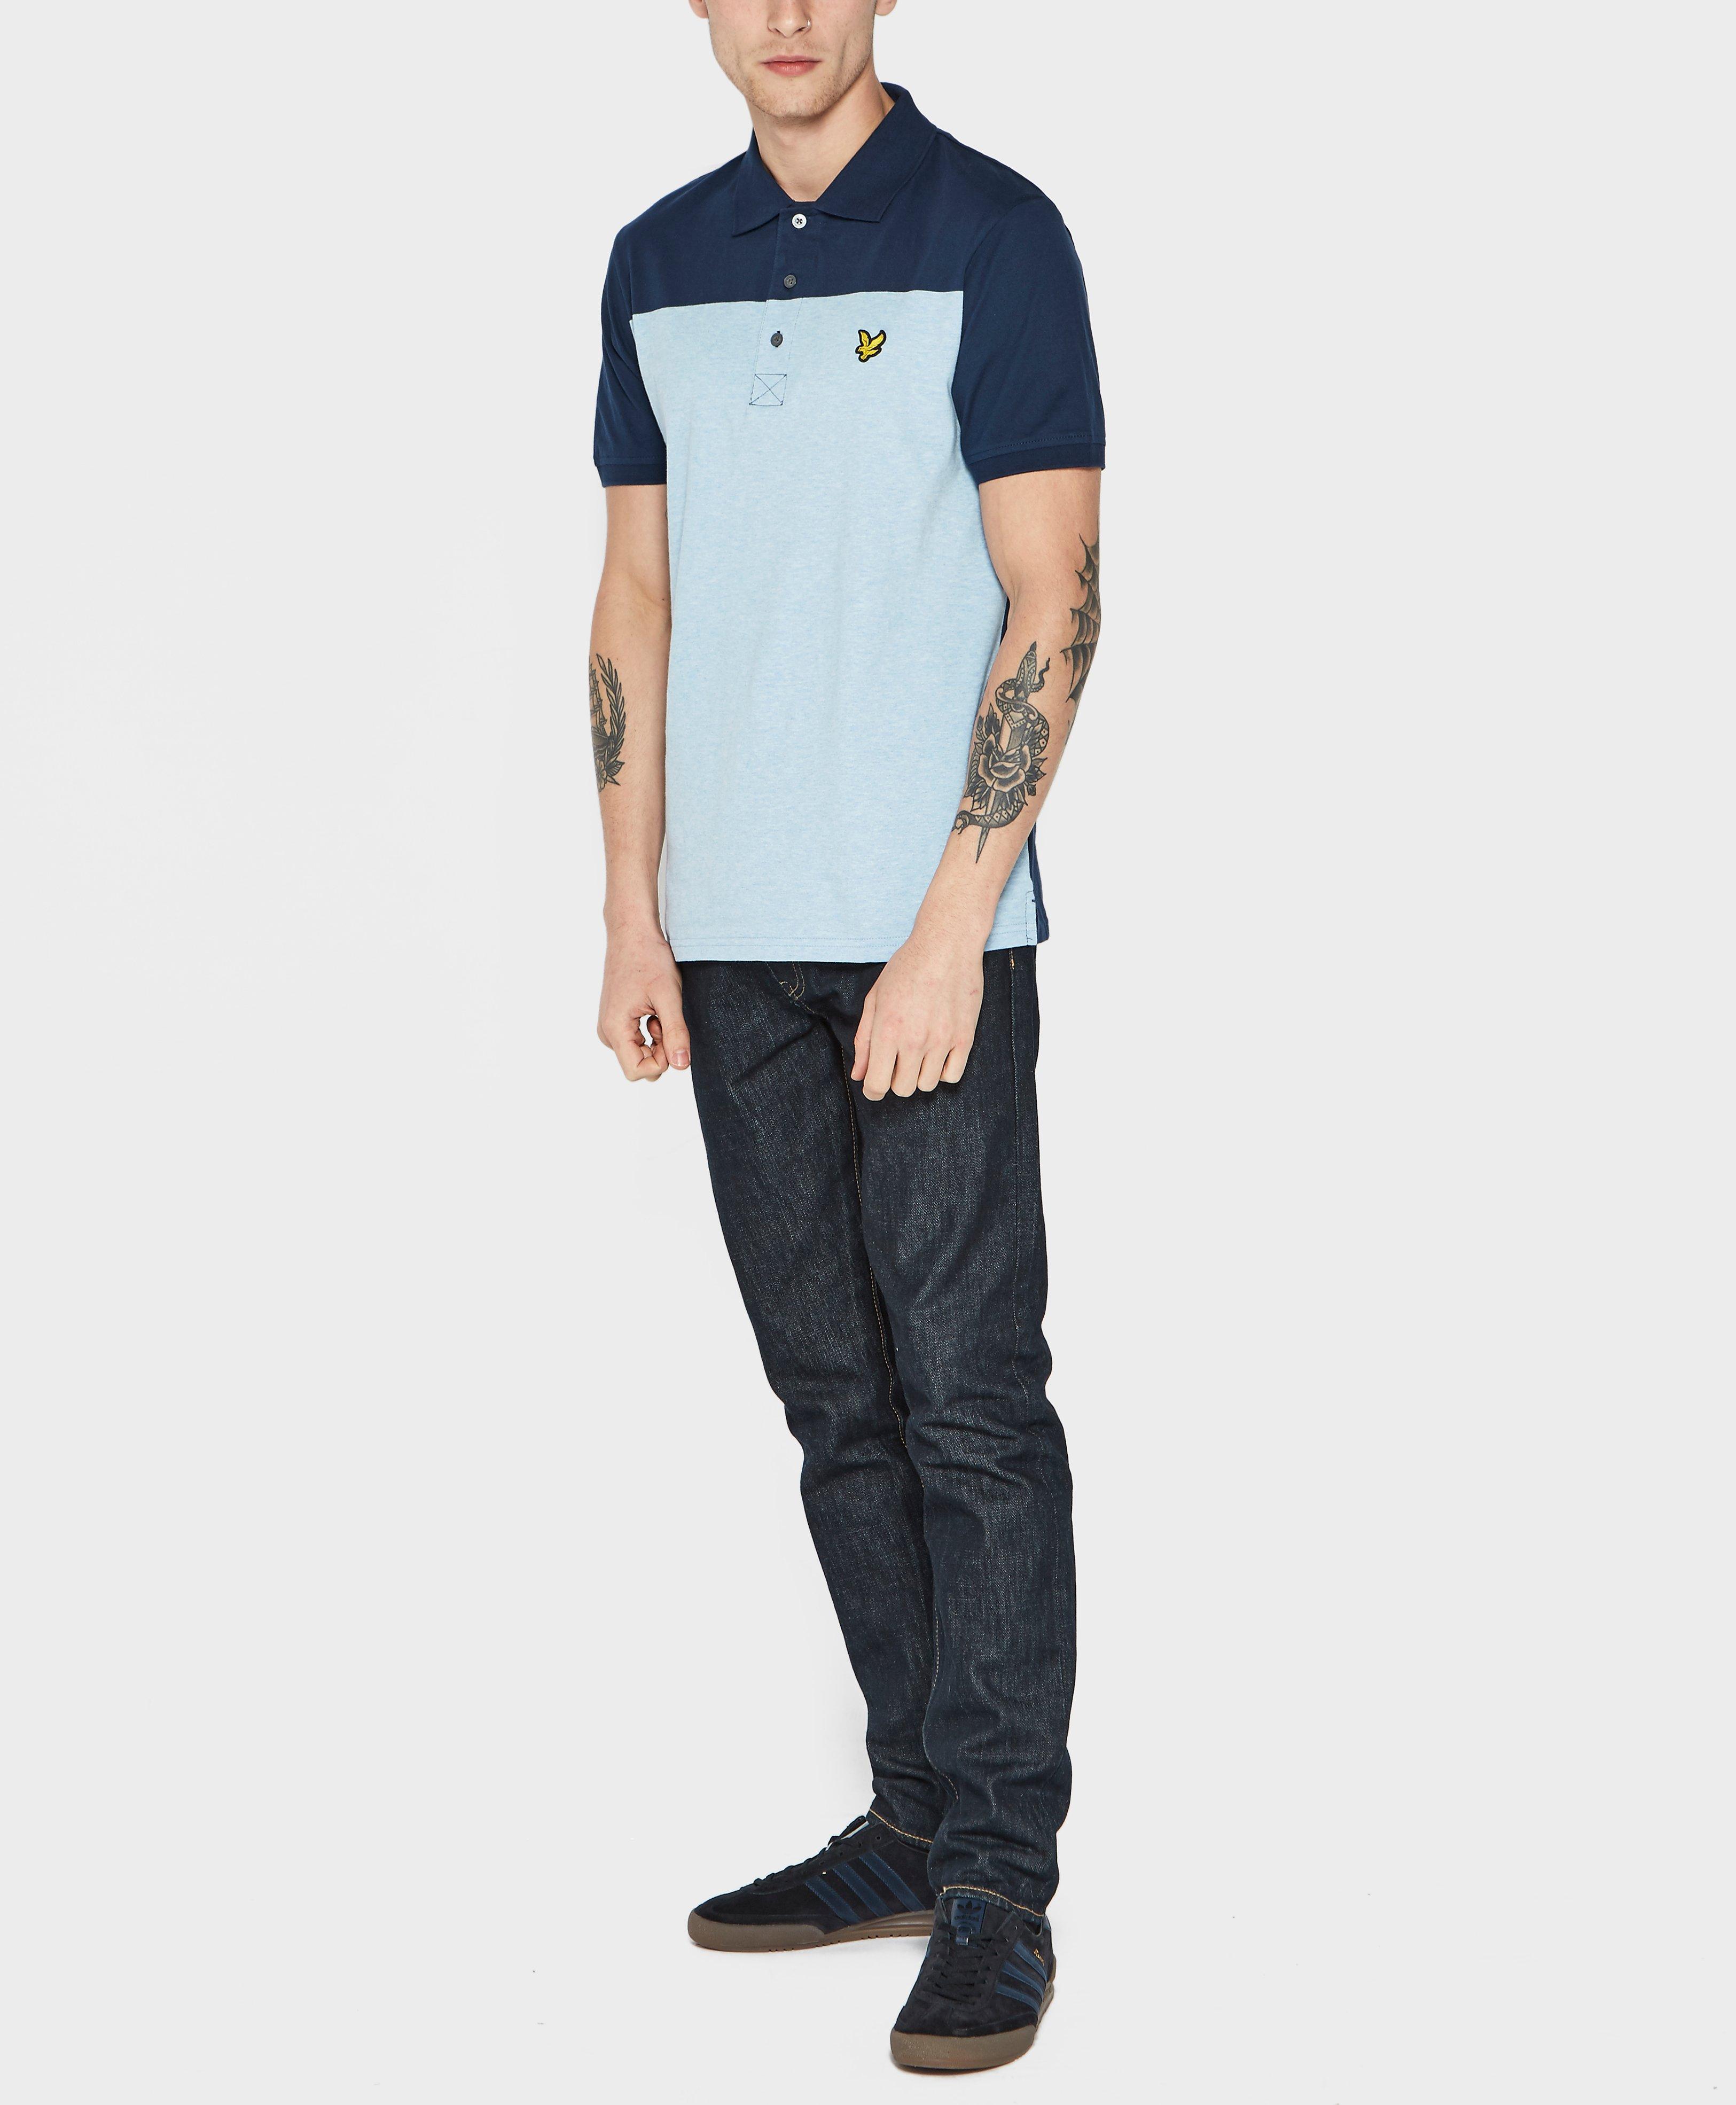 18fe64c300c Lyle   Scott Yoke Polo Shirt in Blue for Men - Lyst